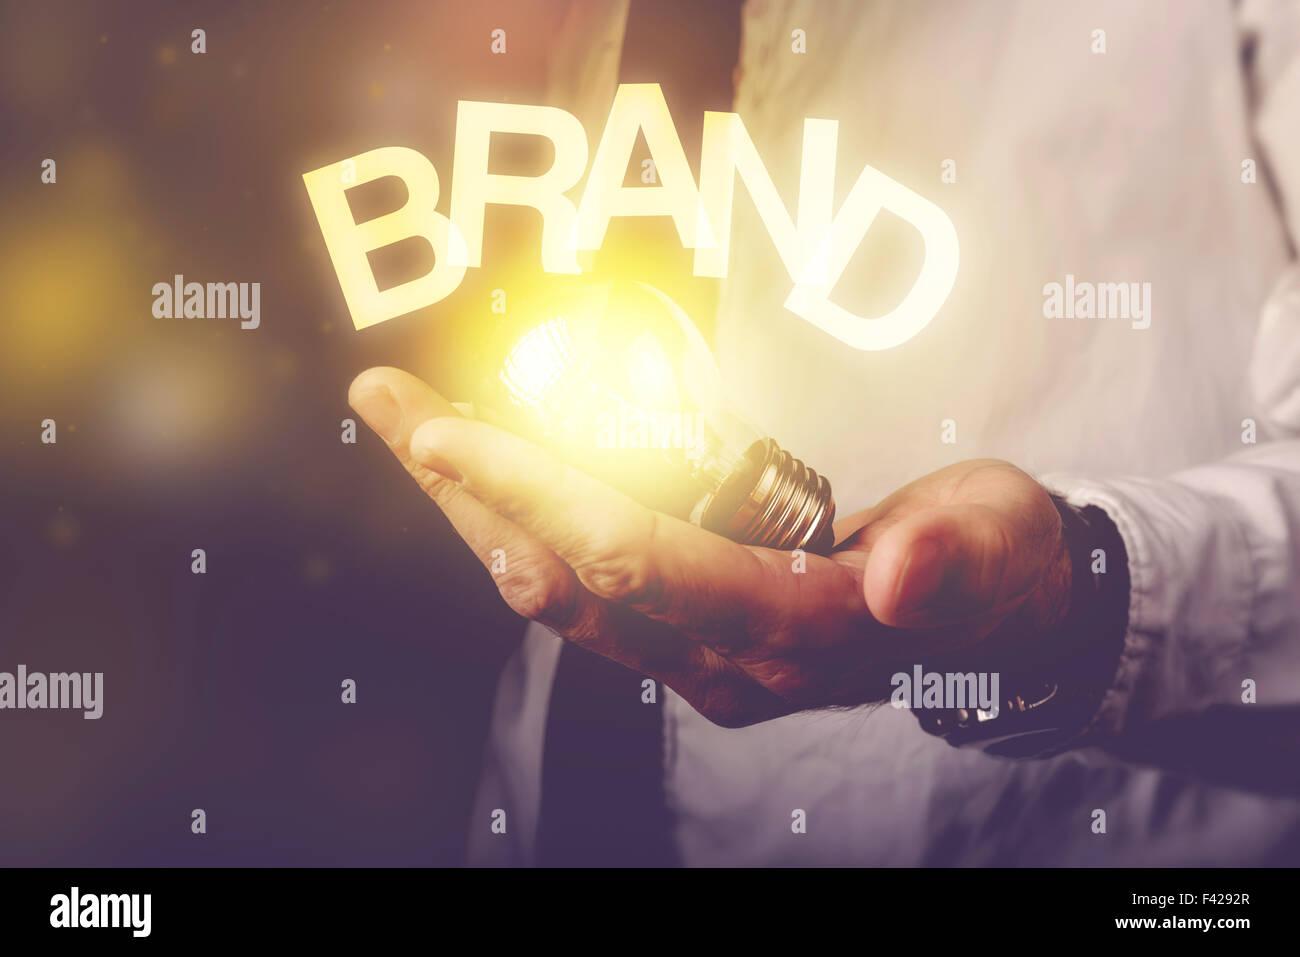 Brand idea concept with businessman holding light bulb, retro toned image, selective focus. - Stock Image